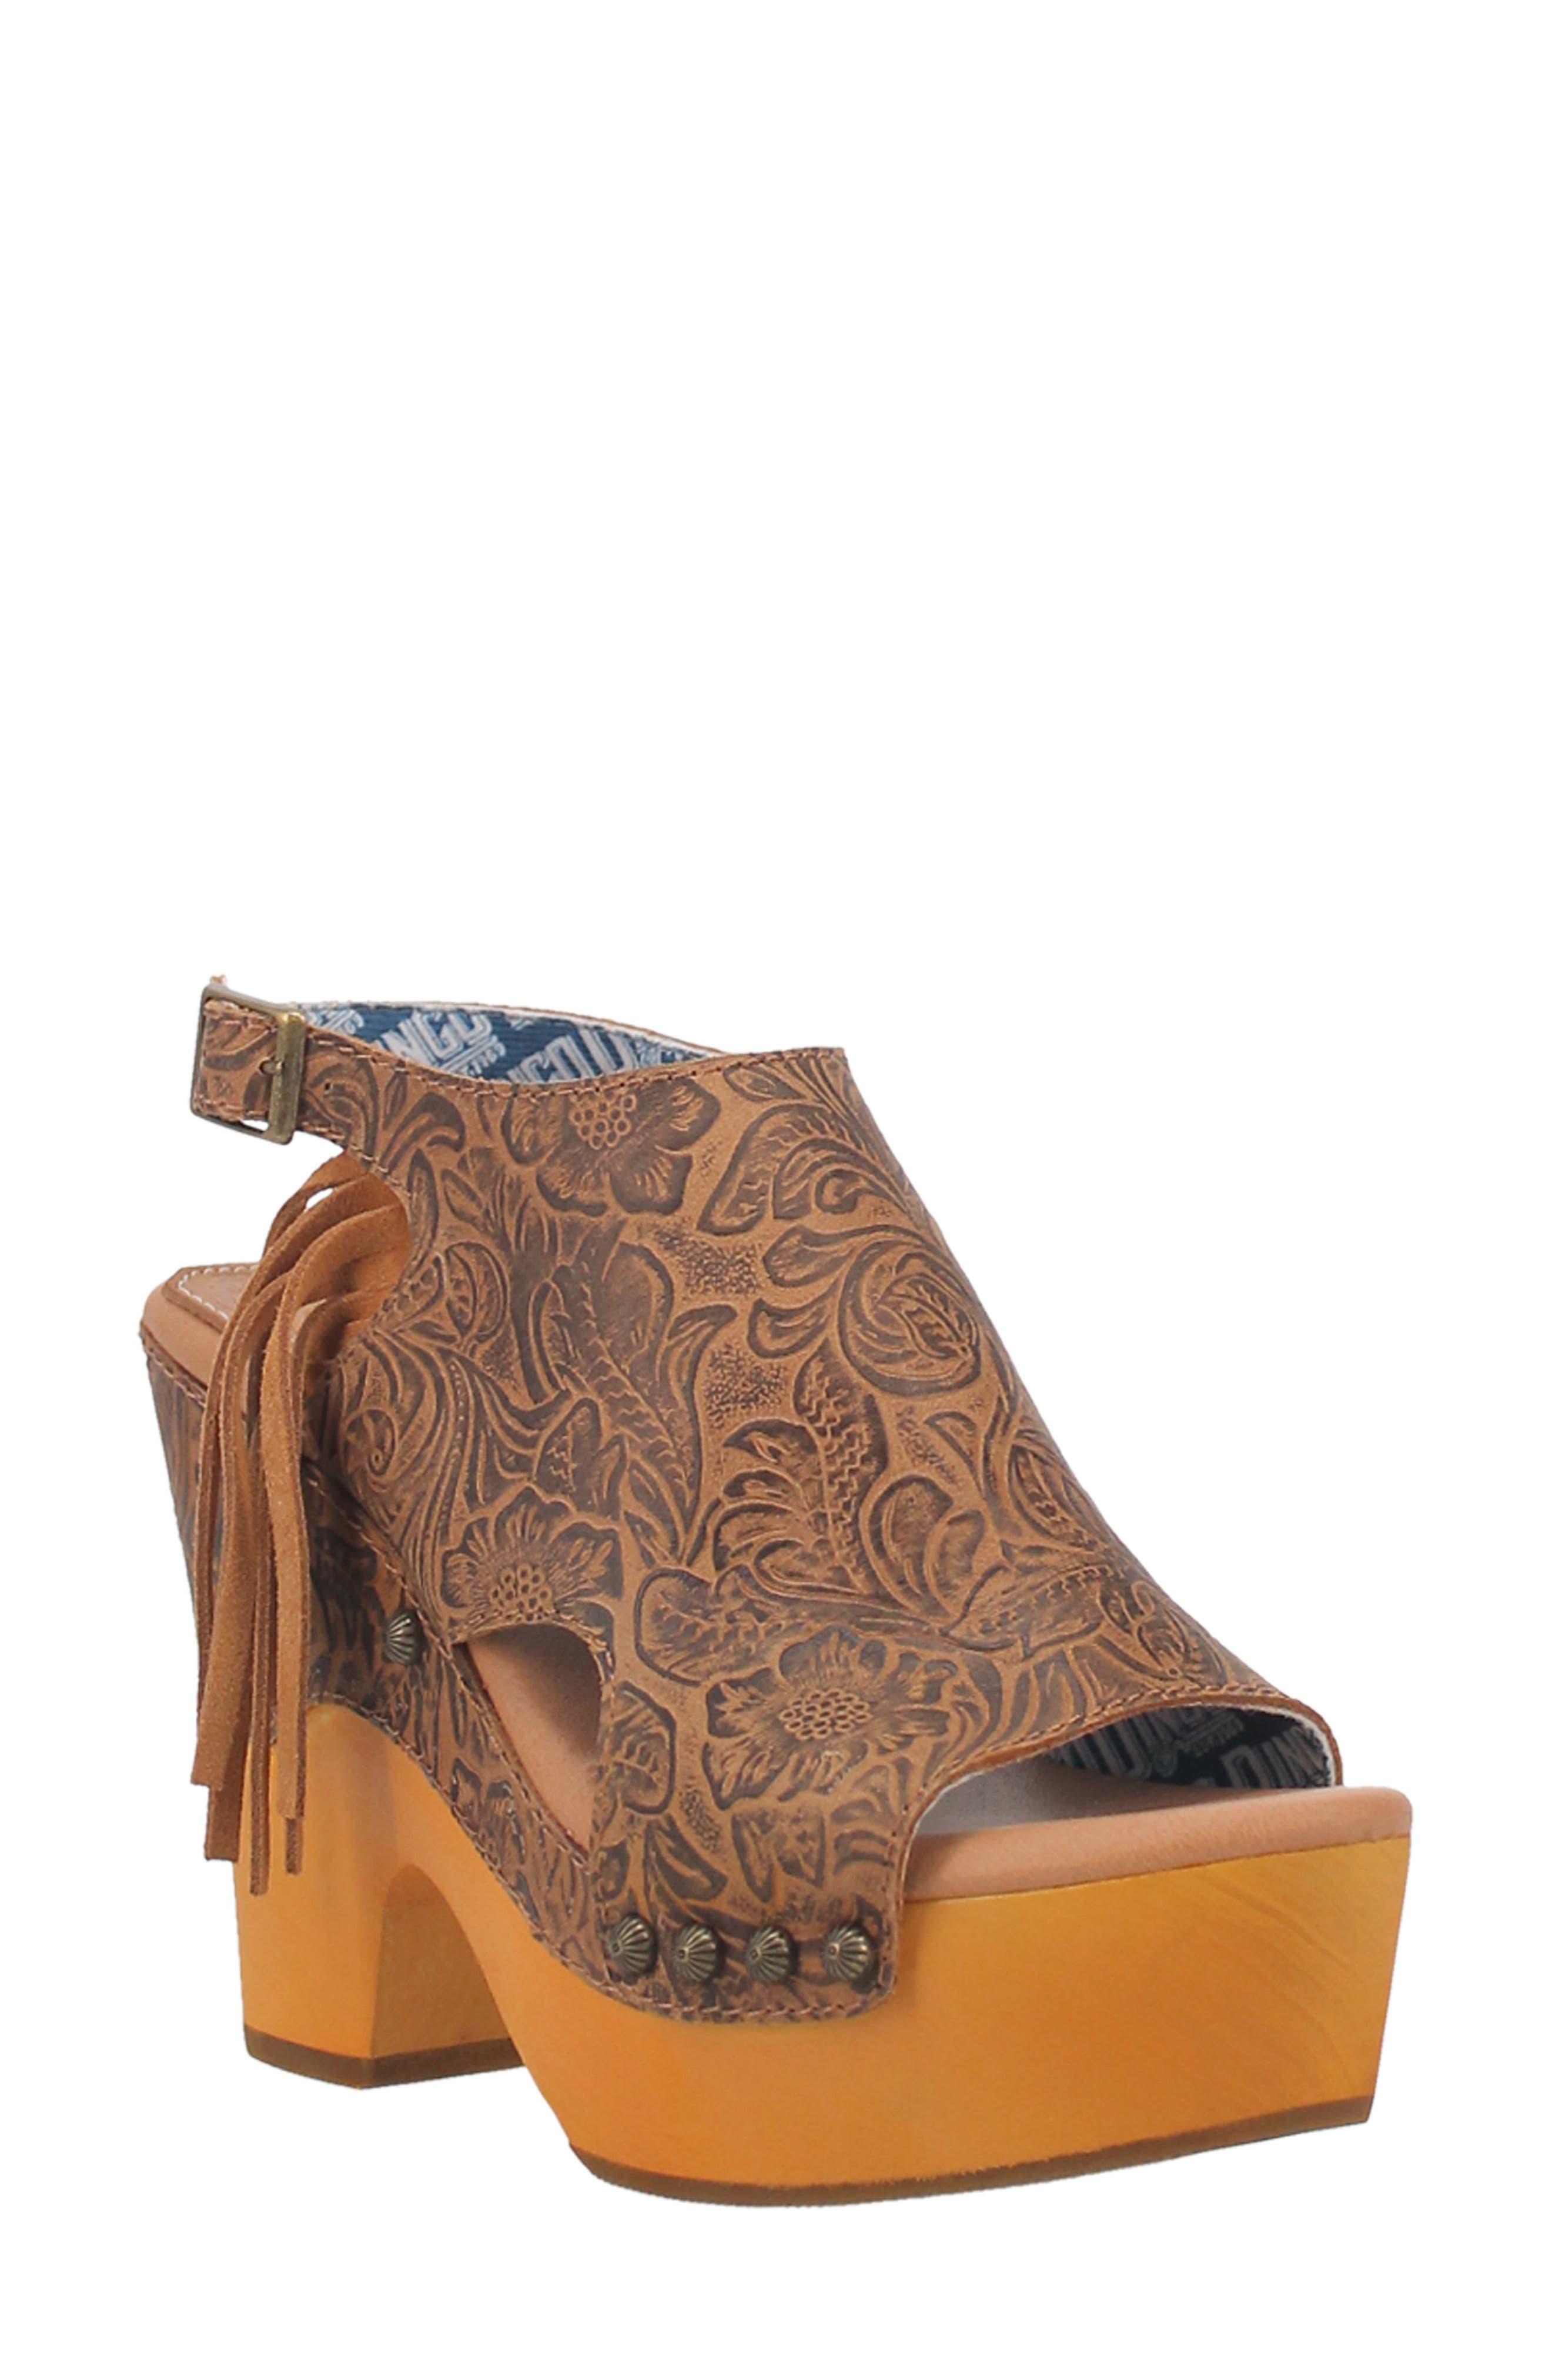 Morocco Slingback Platform Sandal